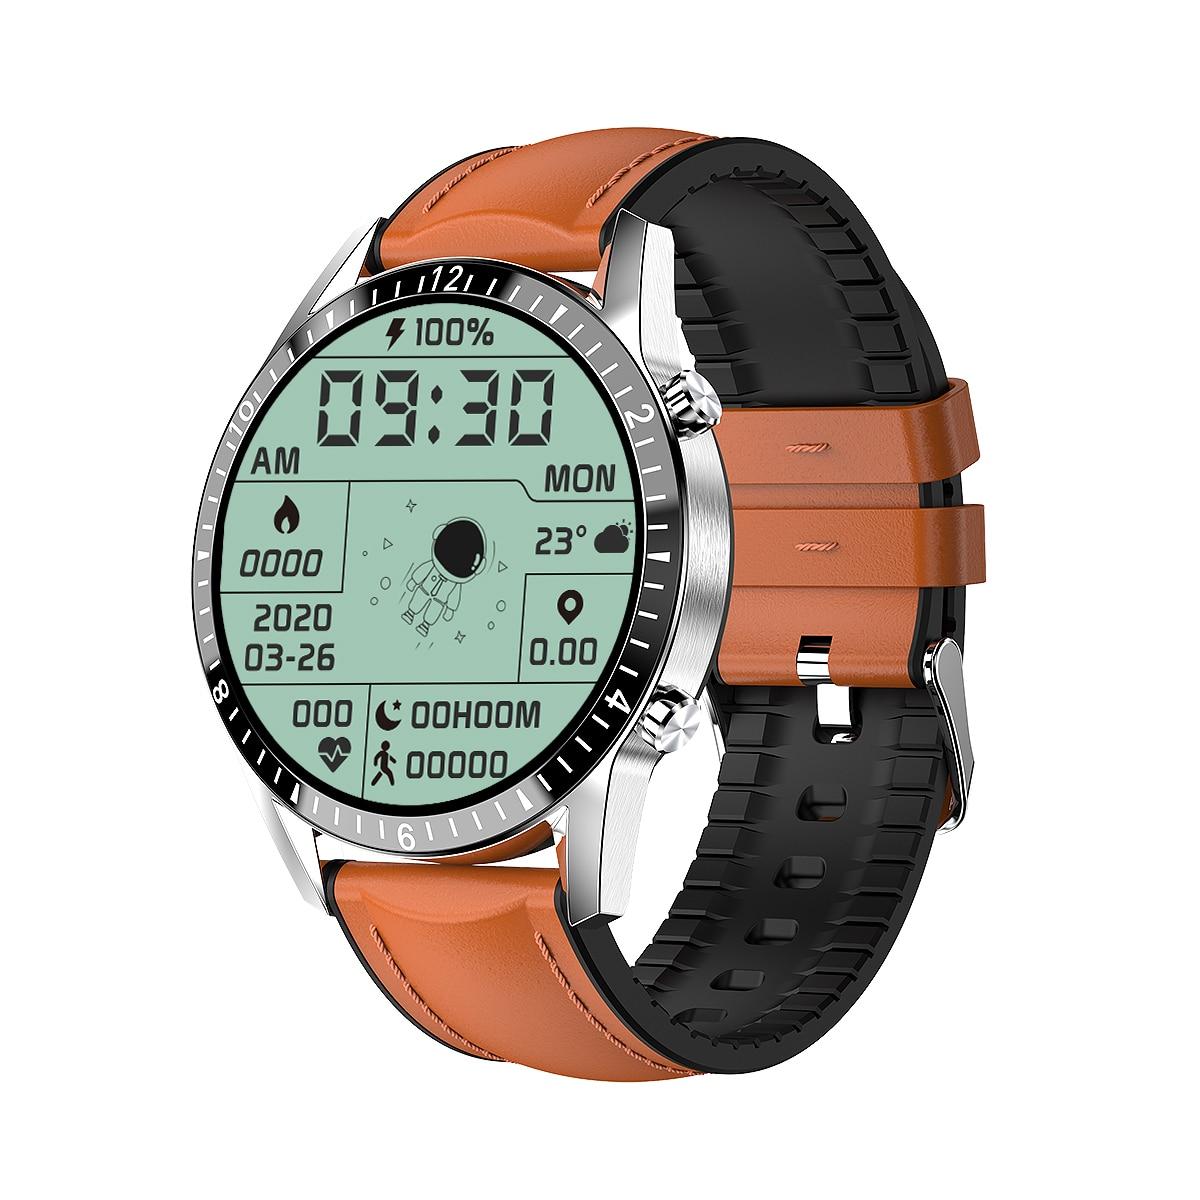 UNIWA I9 بلوتوث الهاتف ساعة ذكية الرجال النساء 1.3 بوصة HD كامل شاشة تعمل باللمس مقاوم للماء الرياضة اللياقة البدنية ساعة تعقب الصحة